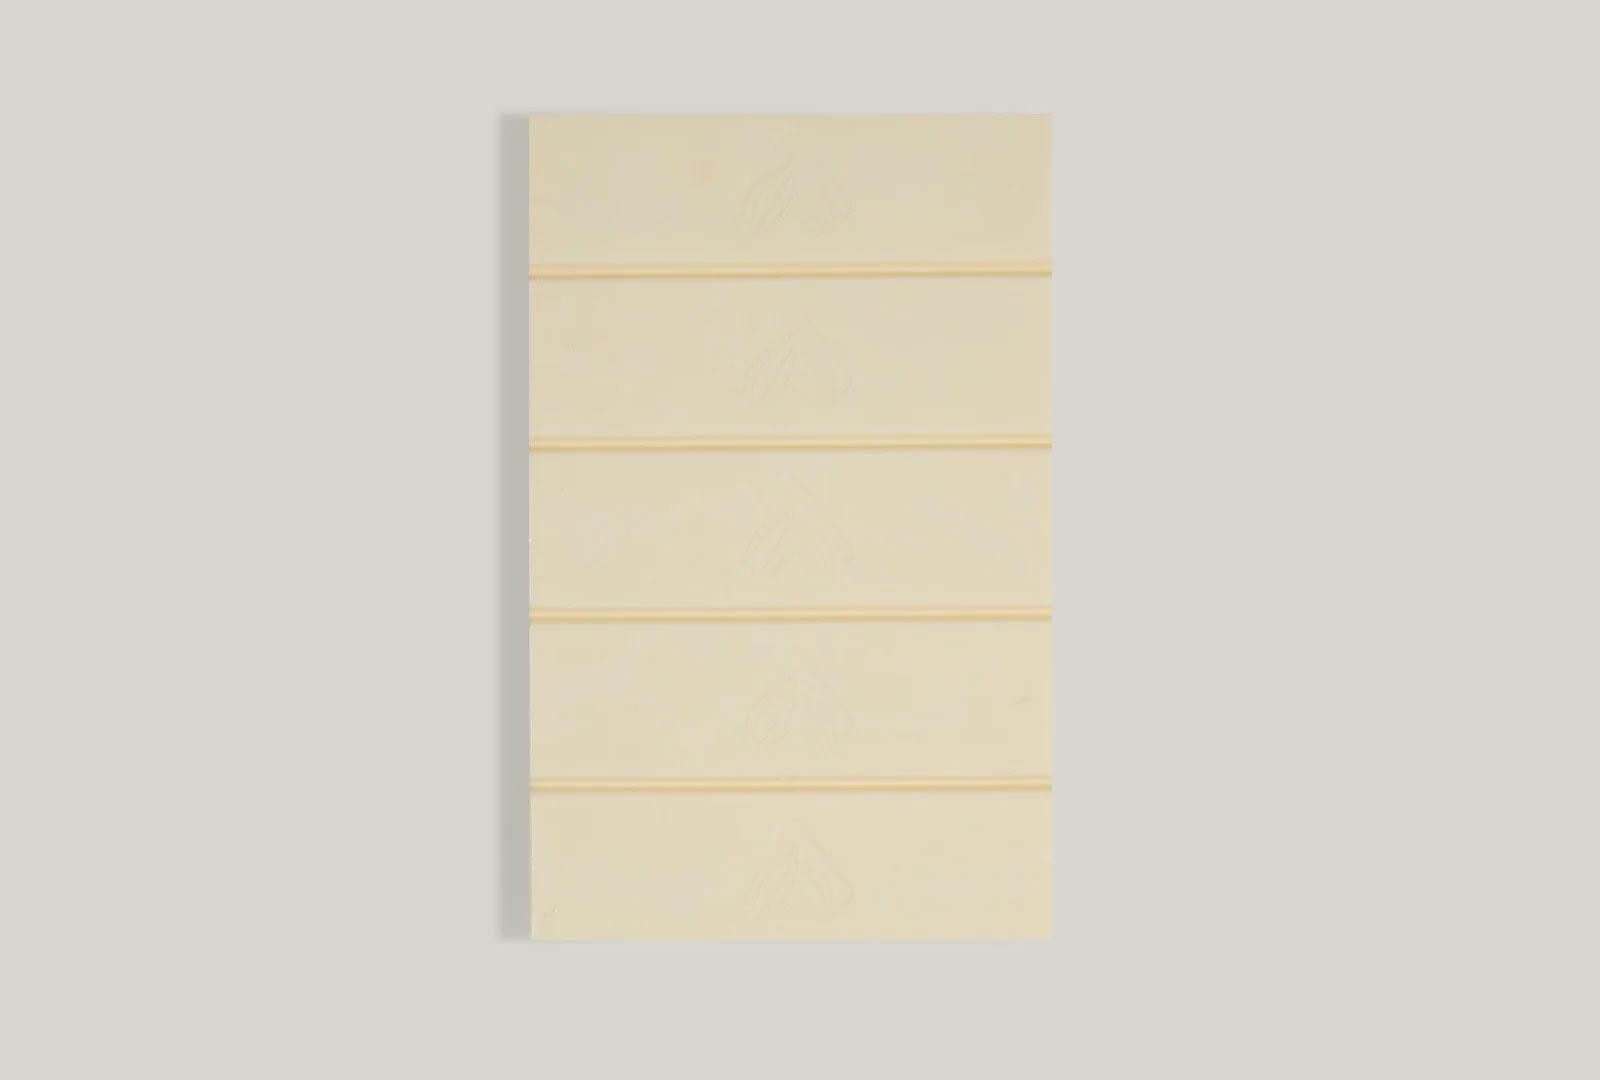 white-Chocolate-Compound-actual-1-1